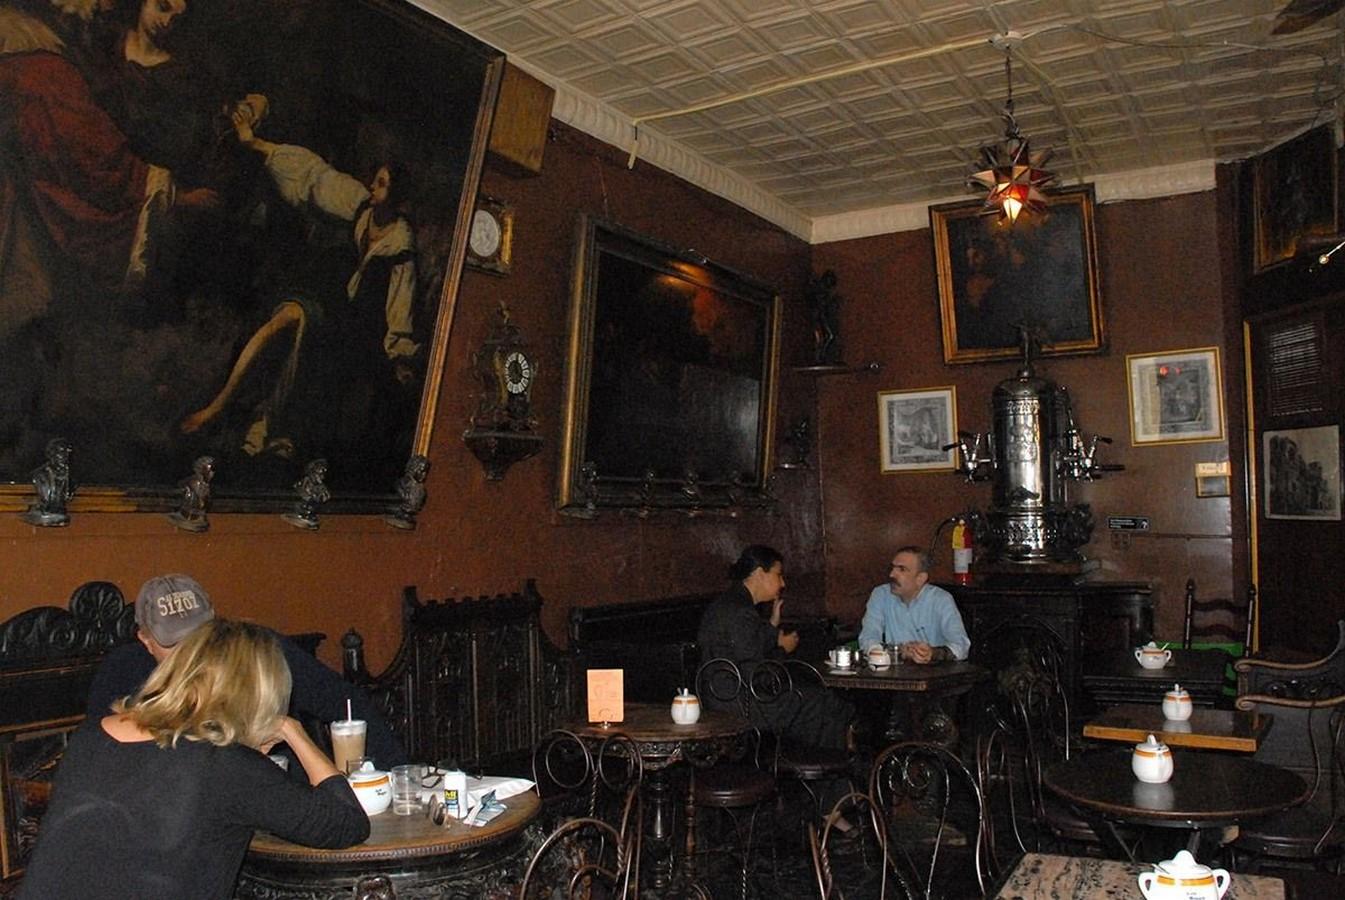 Caffè Reggio, New York City: The Oldest Bohemian Hangout - Sheet